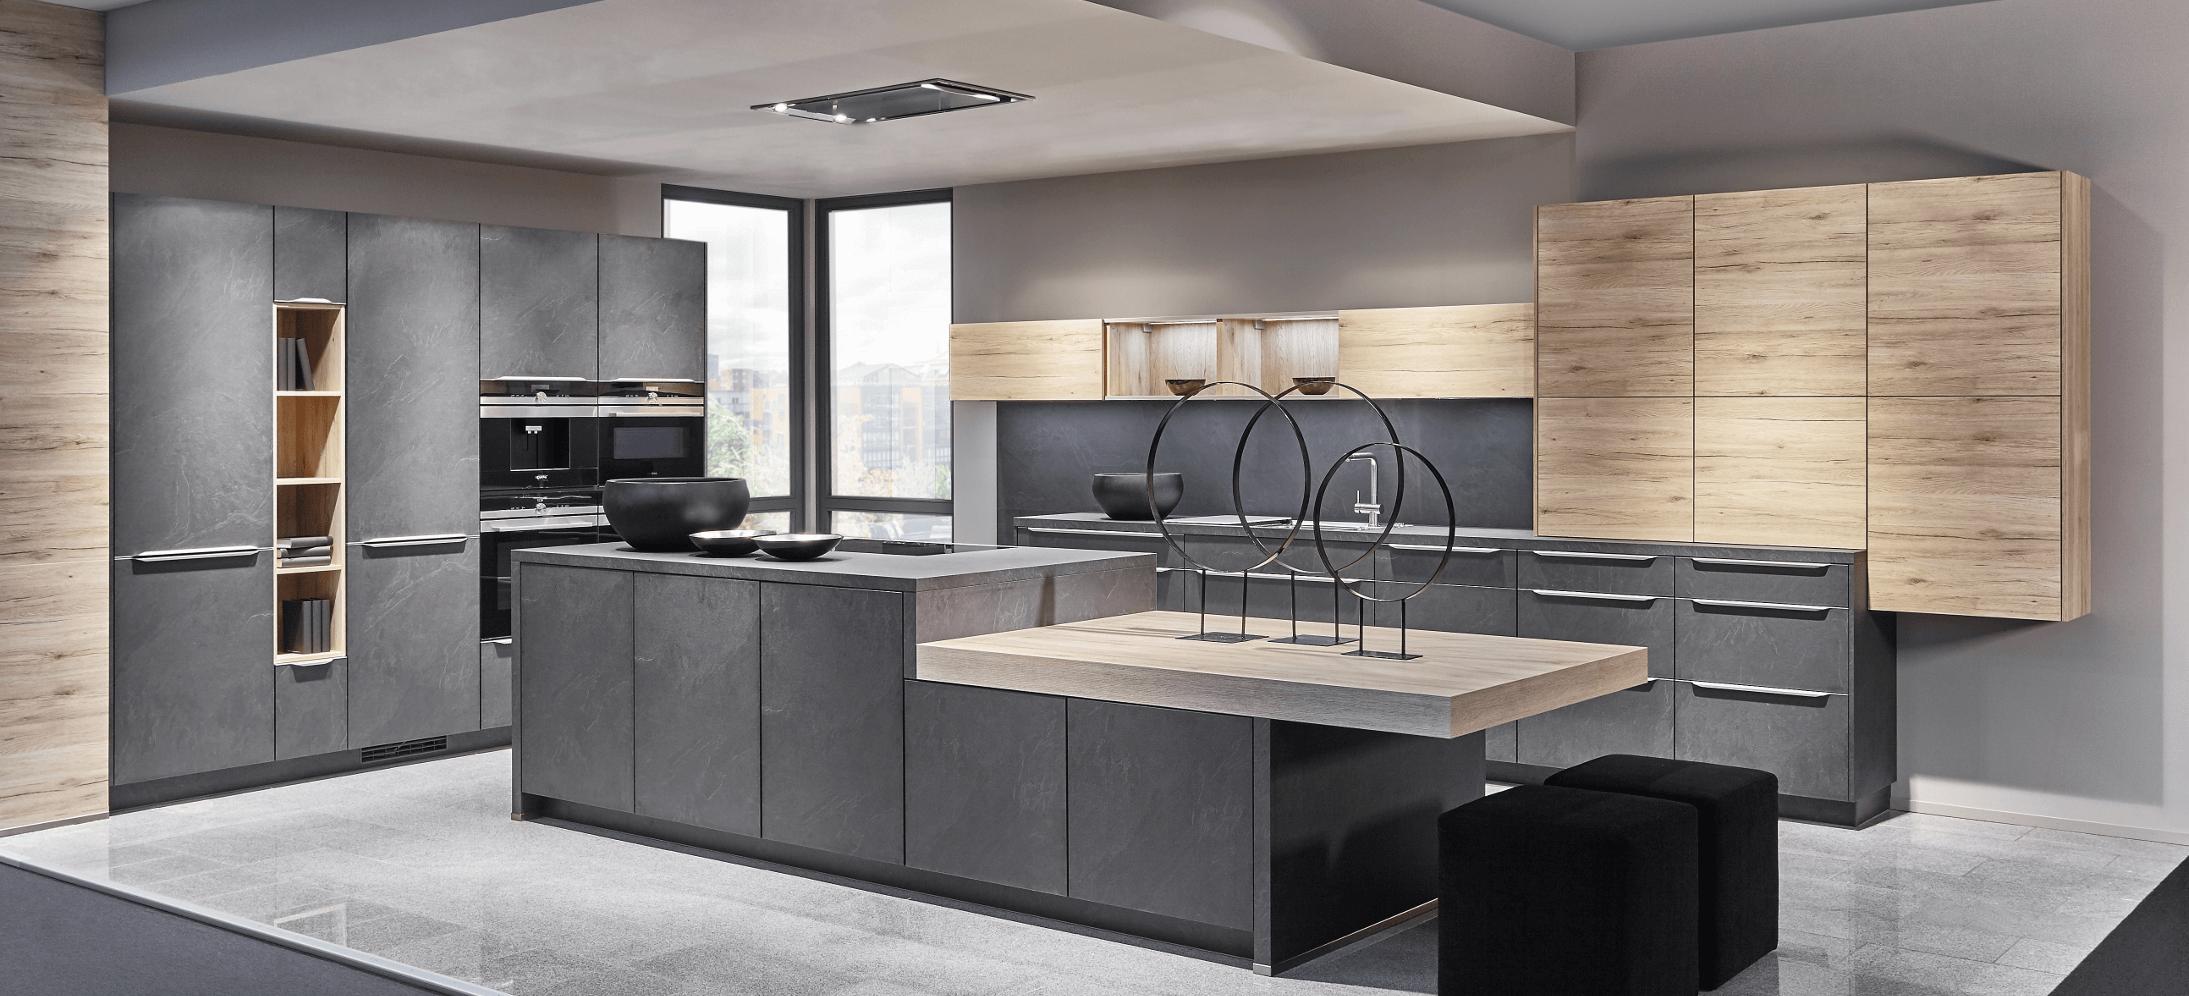 uv kitchen cabinets